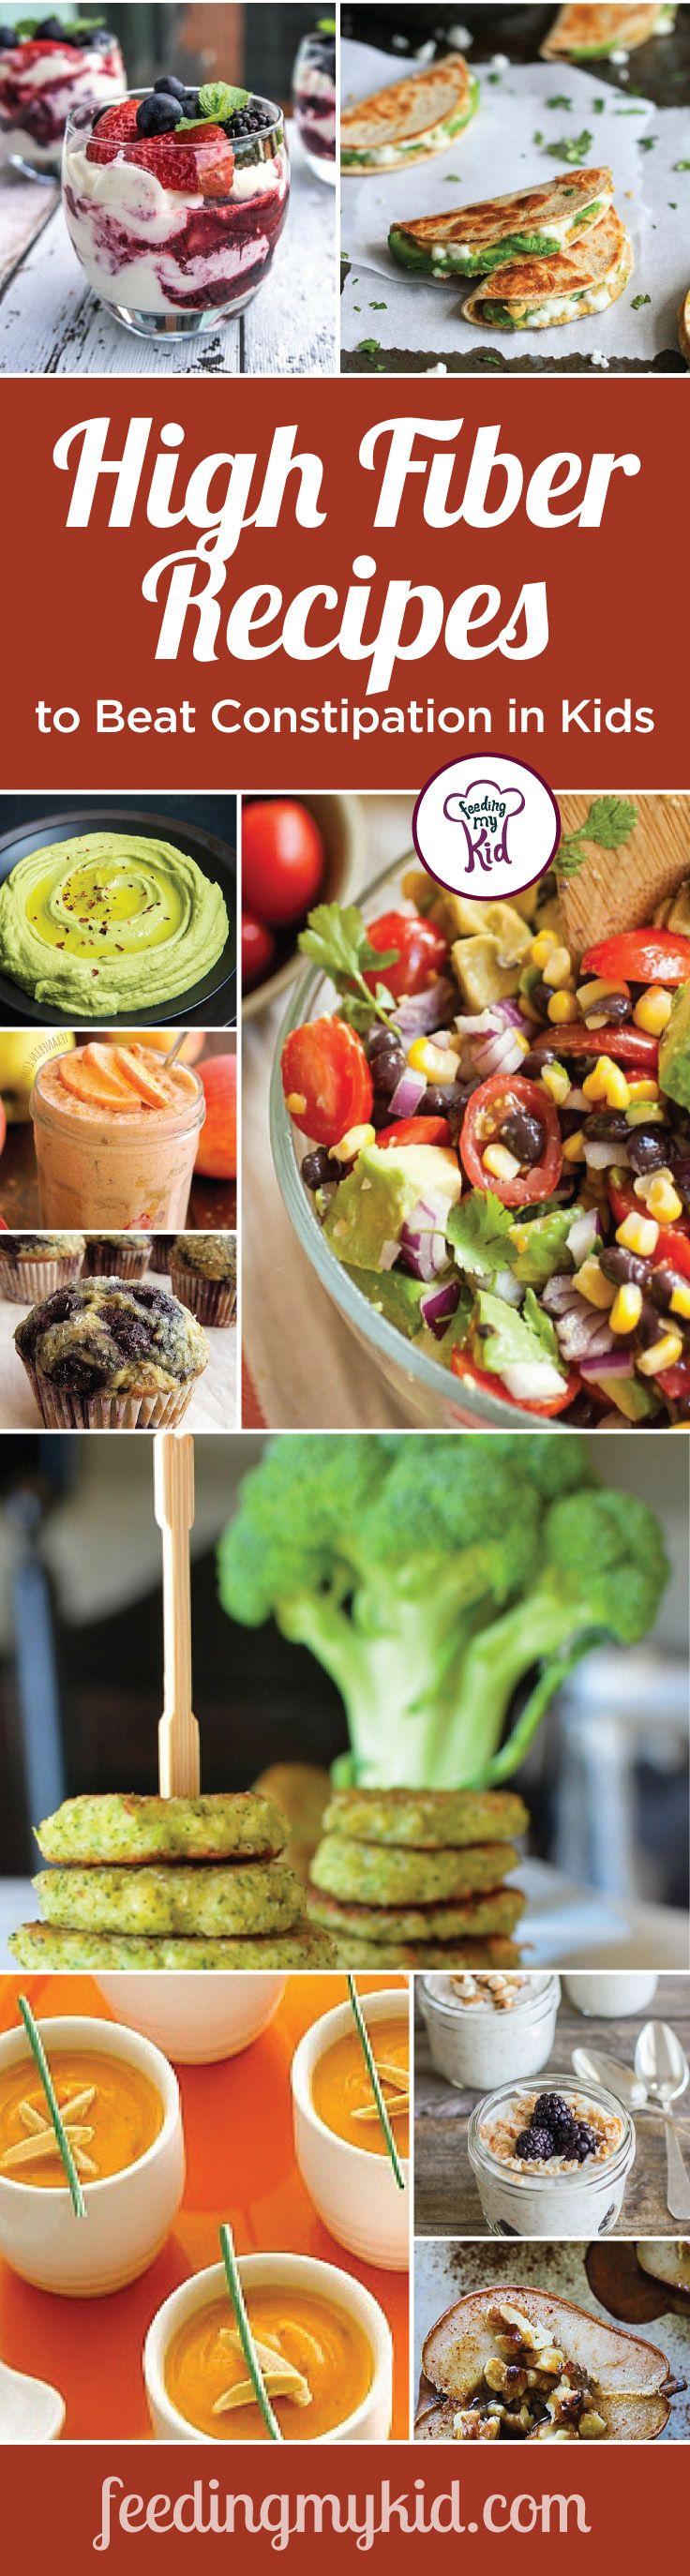 Pin on Healthified Foods Making Kid's Food Healthier